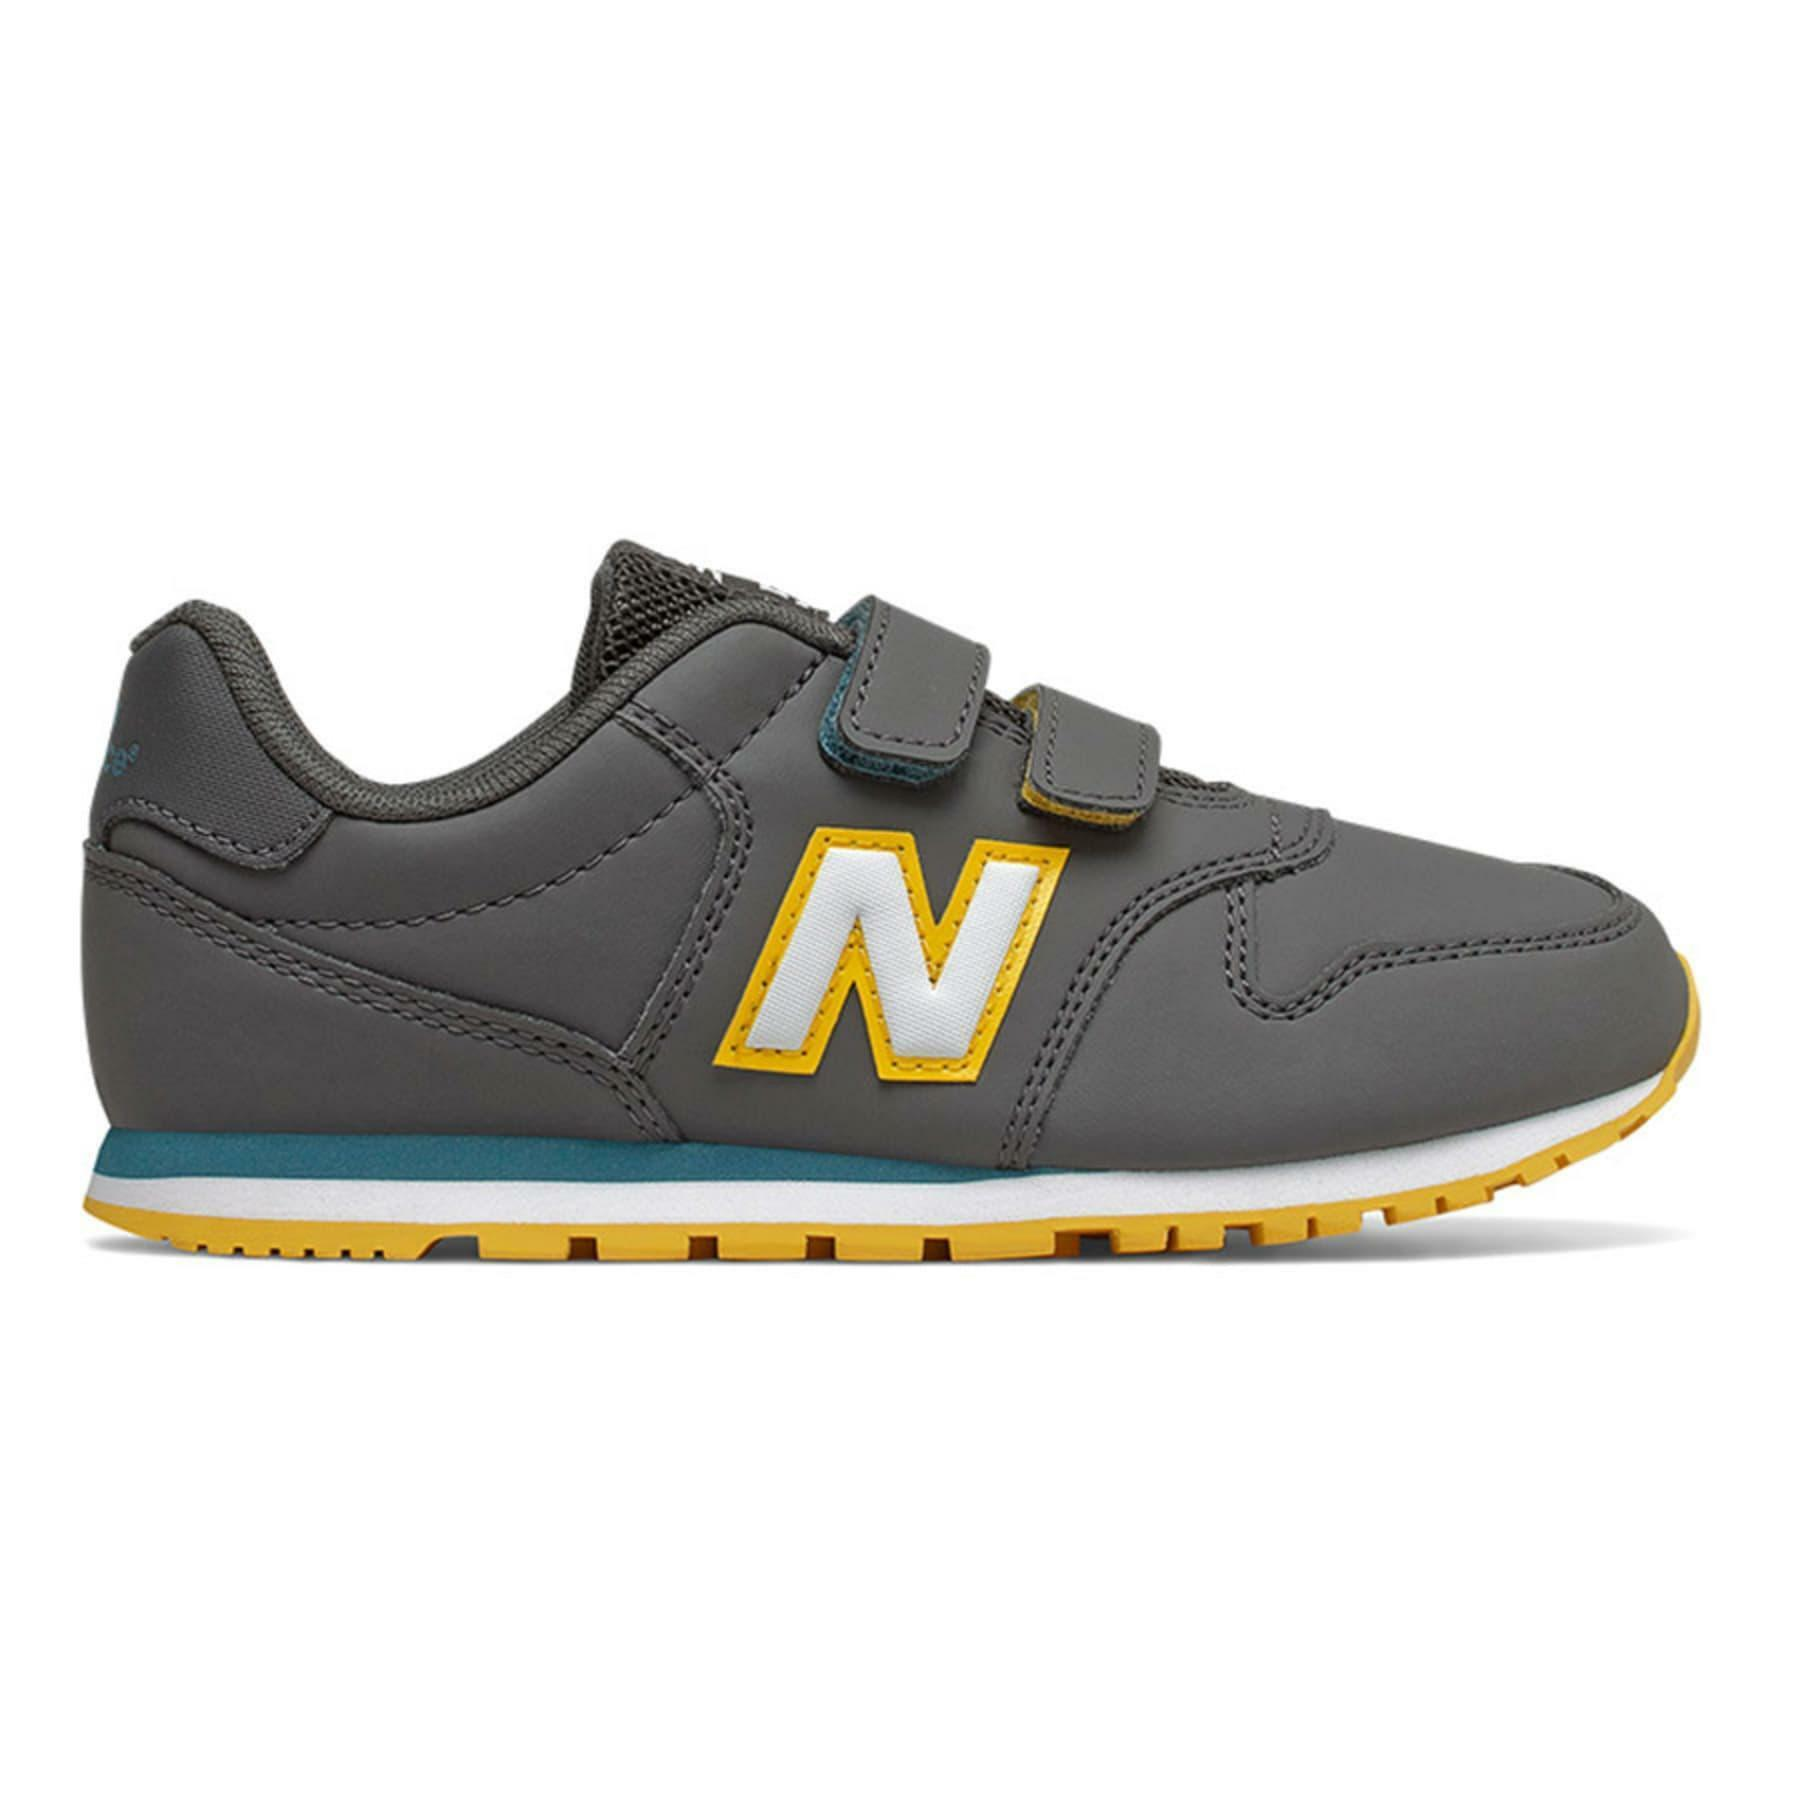 New balance sportivo yv500rgb grigio scarpe sportive bambino